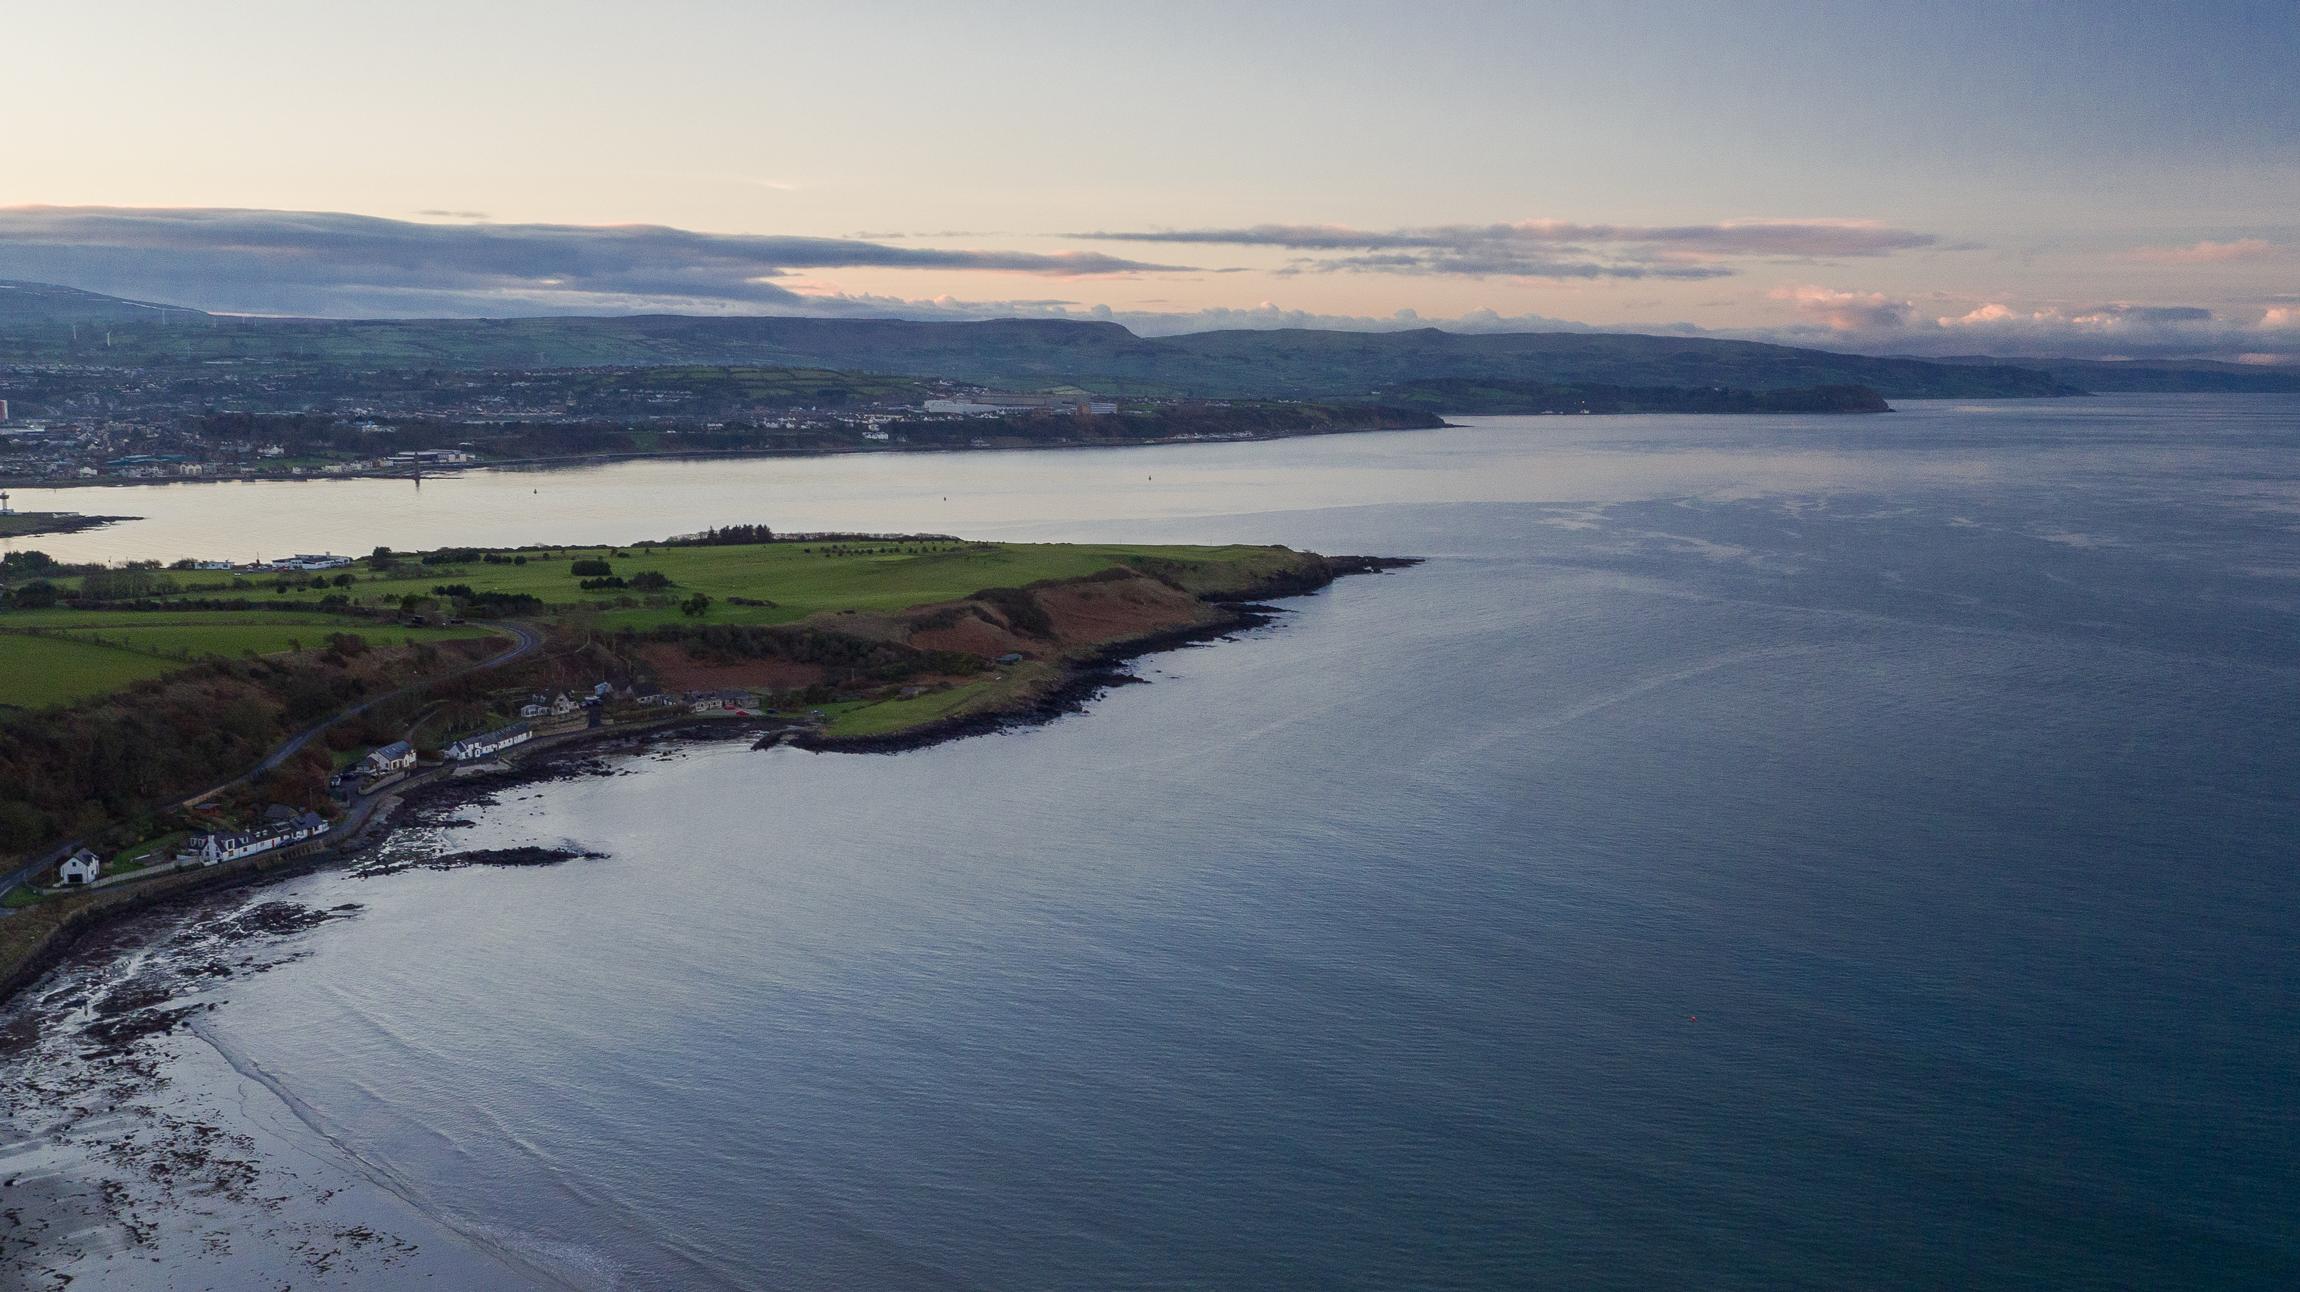 Browns Bay, Co Antrim